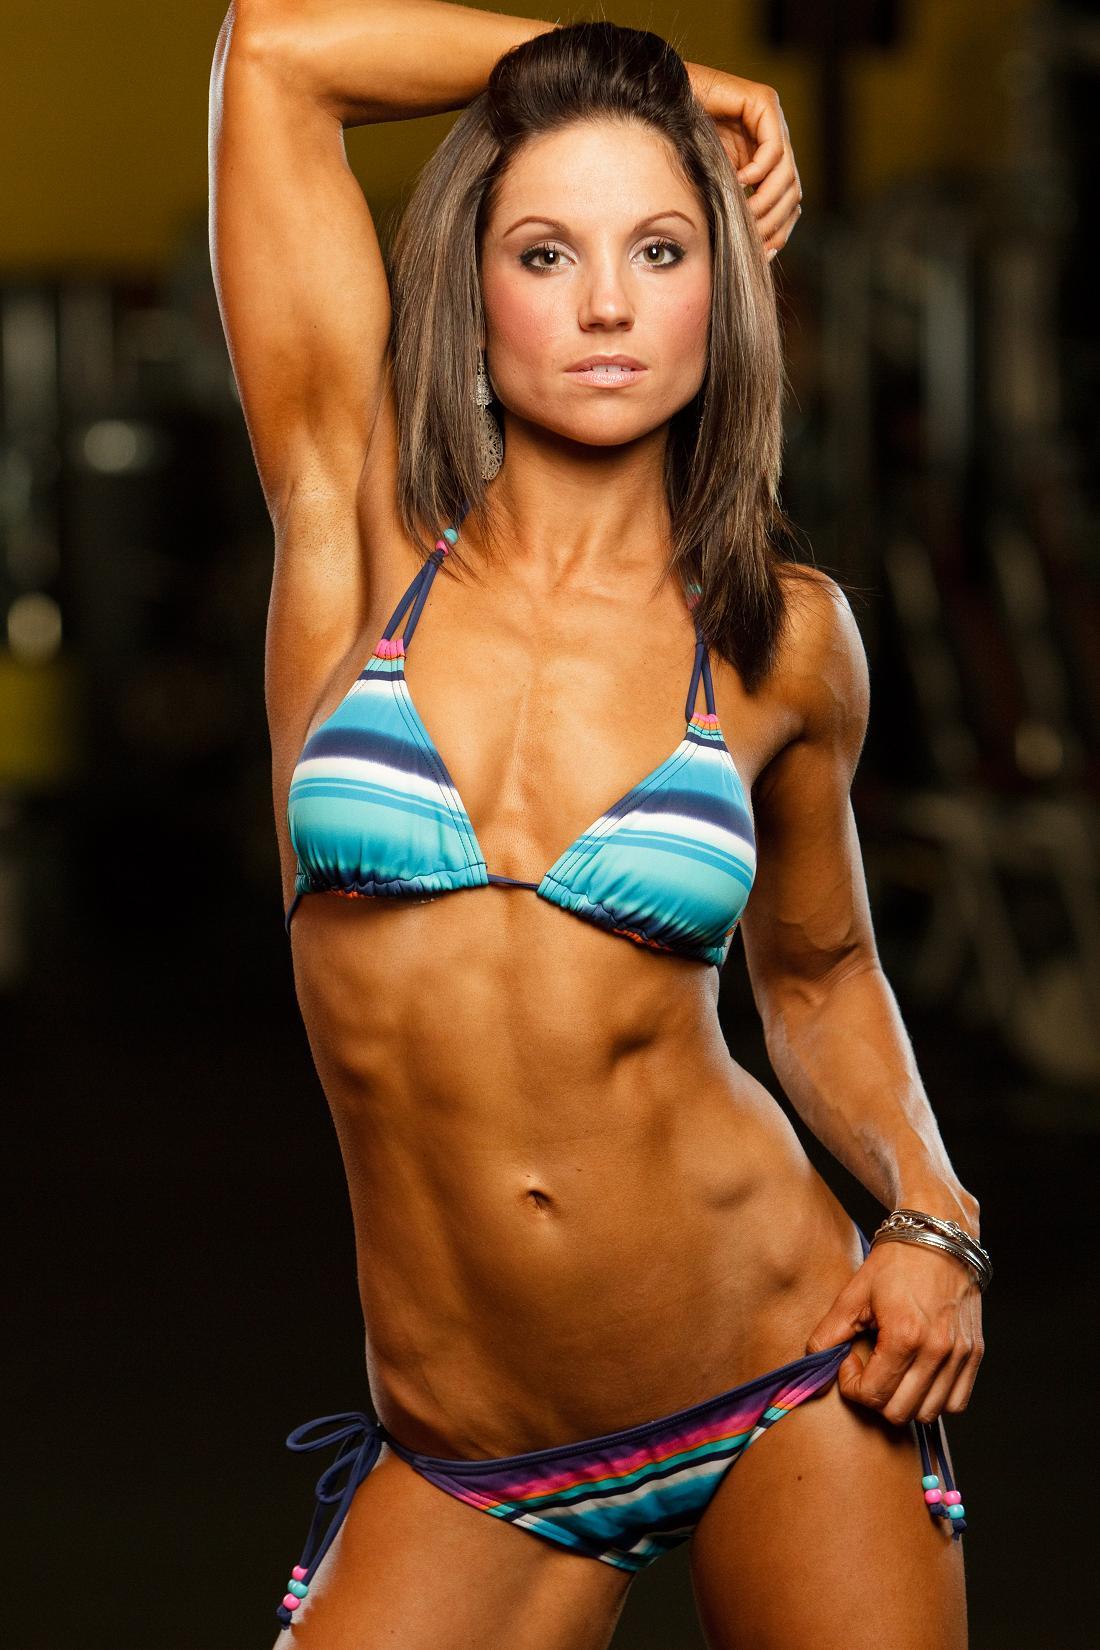 hot fitness women bikini